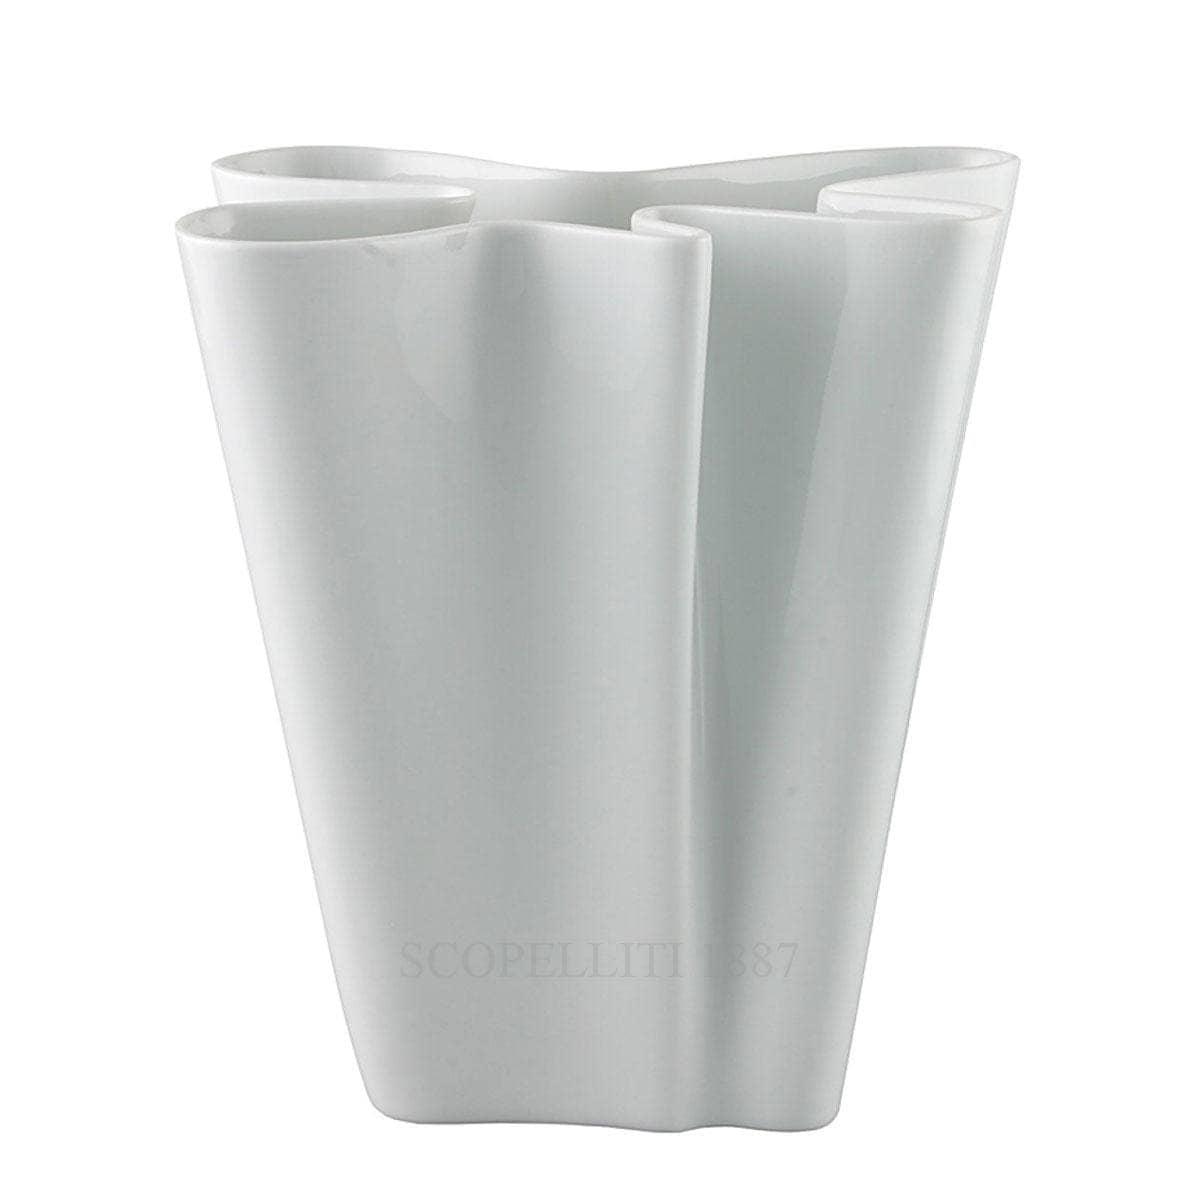 rosenthal studioline flux designer white vase